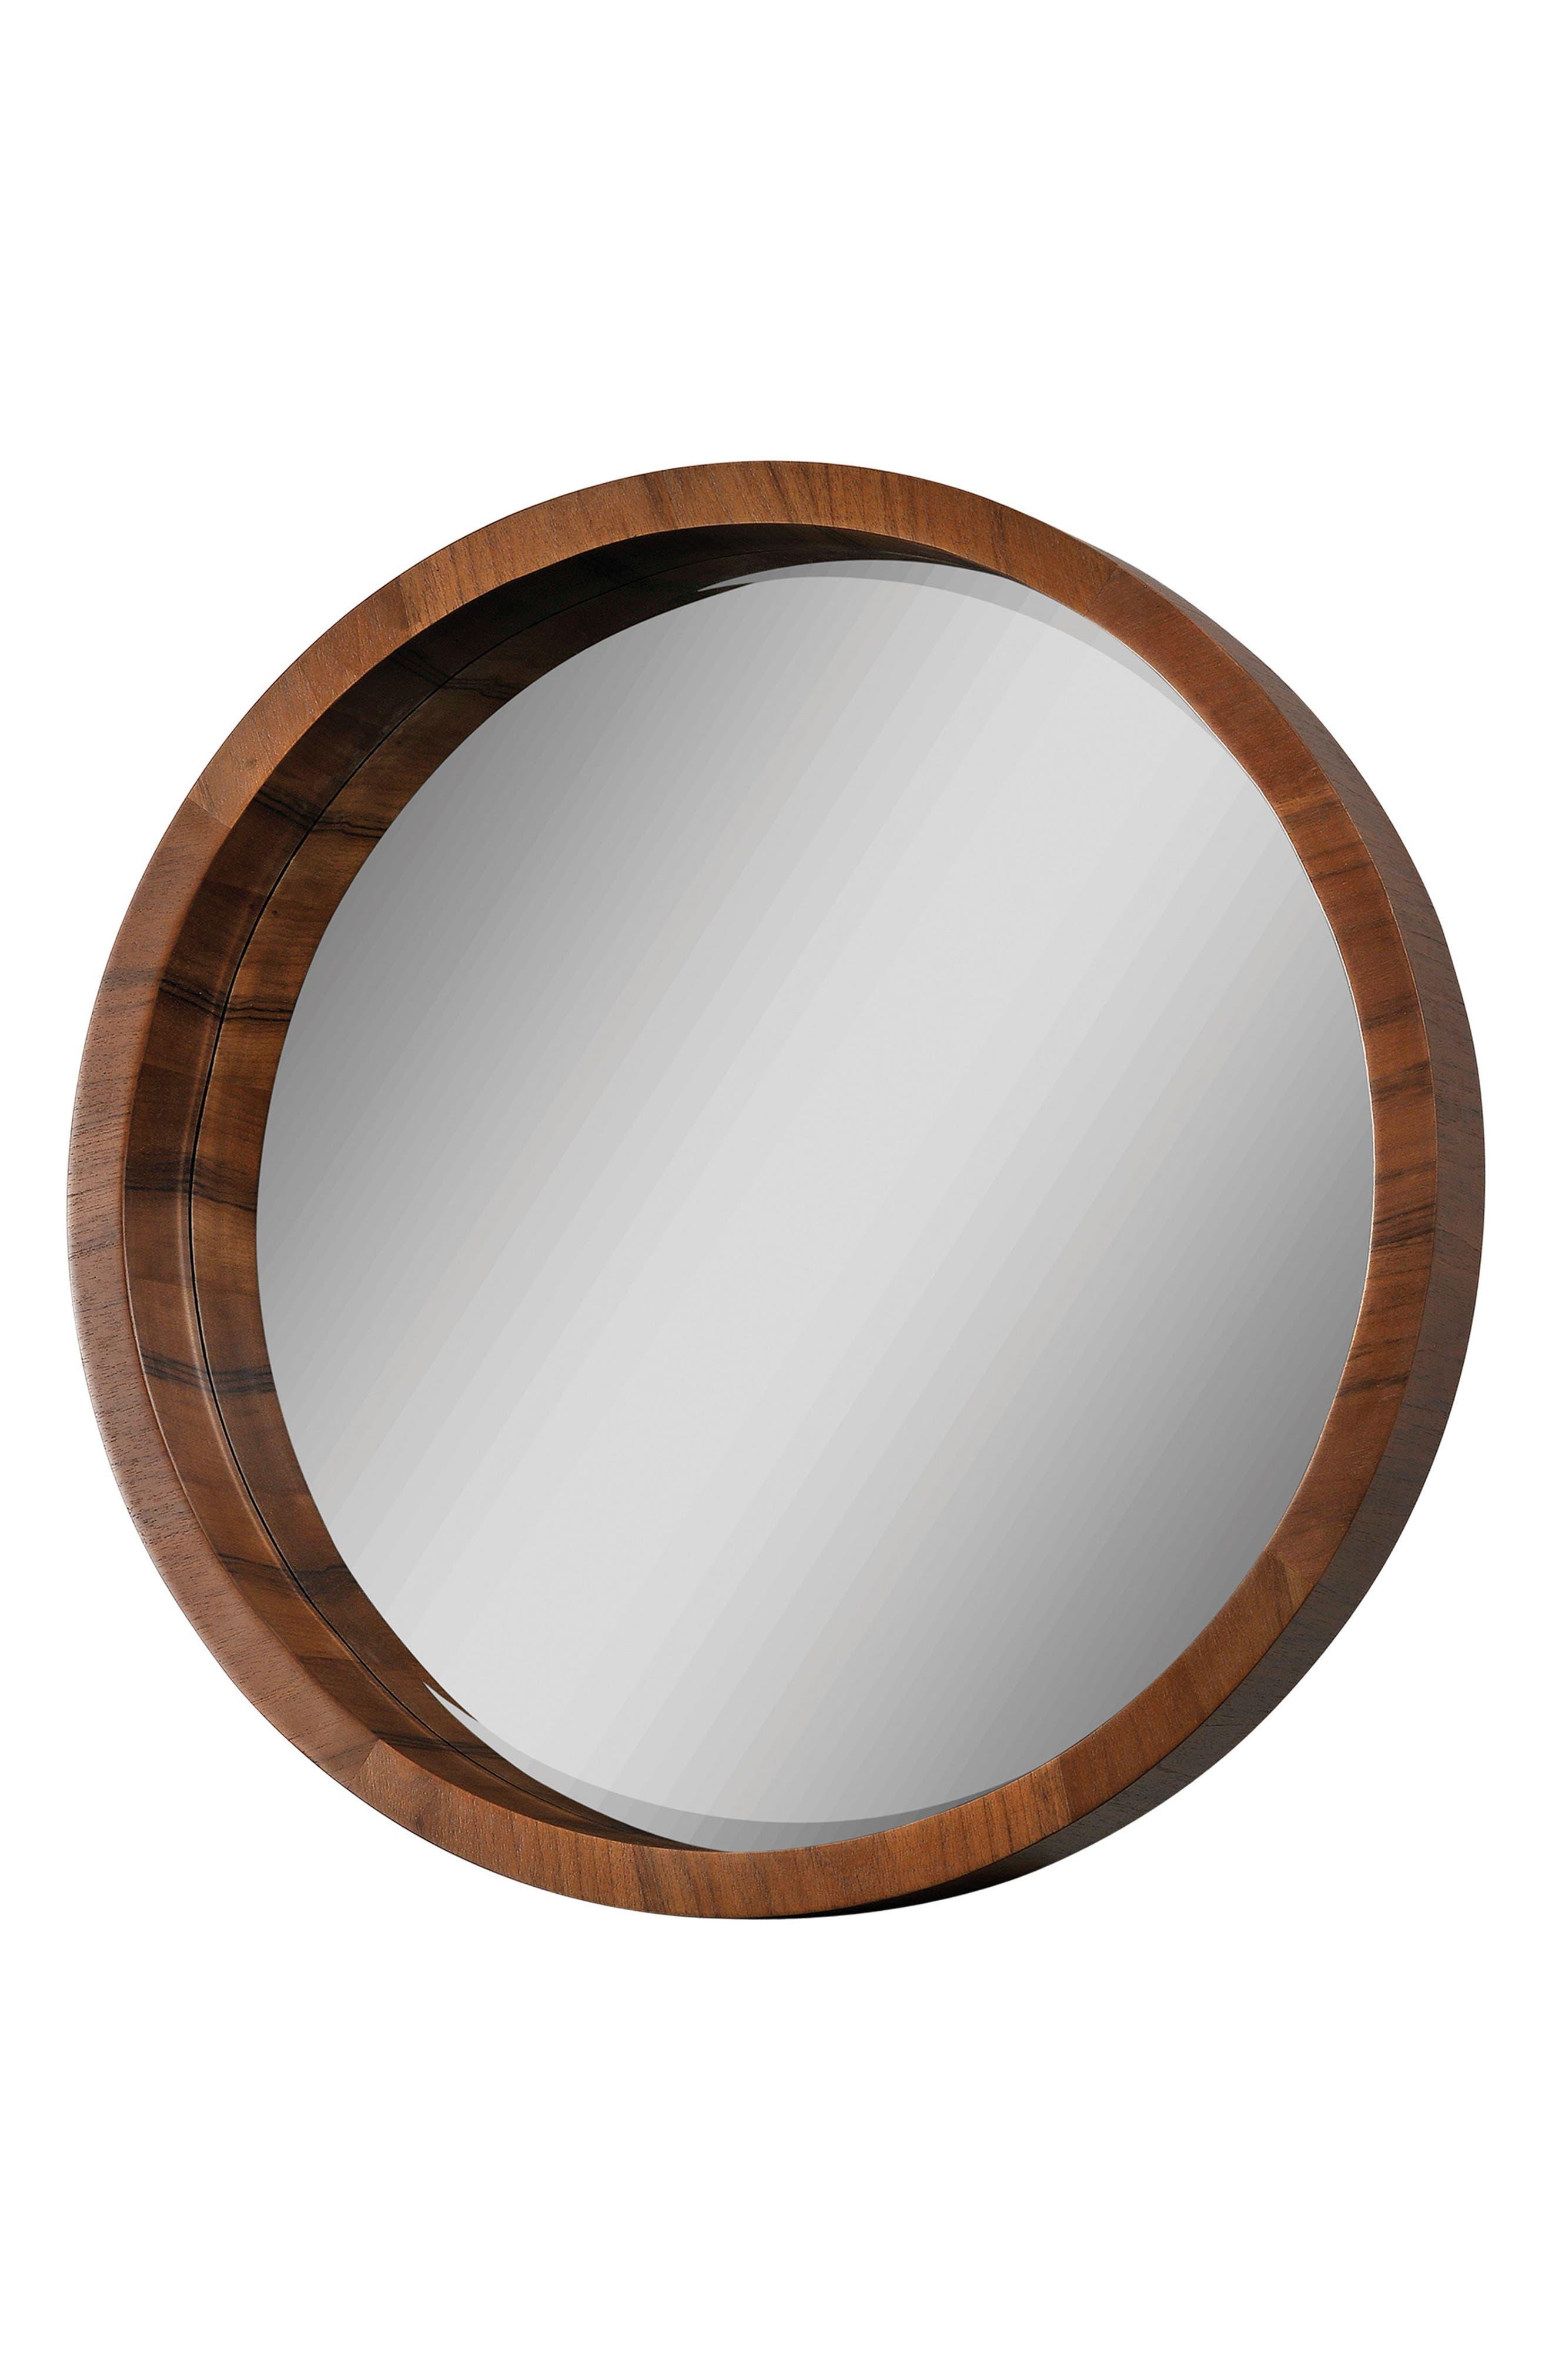 Main Image - Renwil Brynjar Mirror